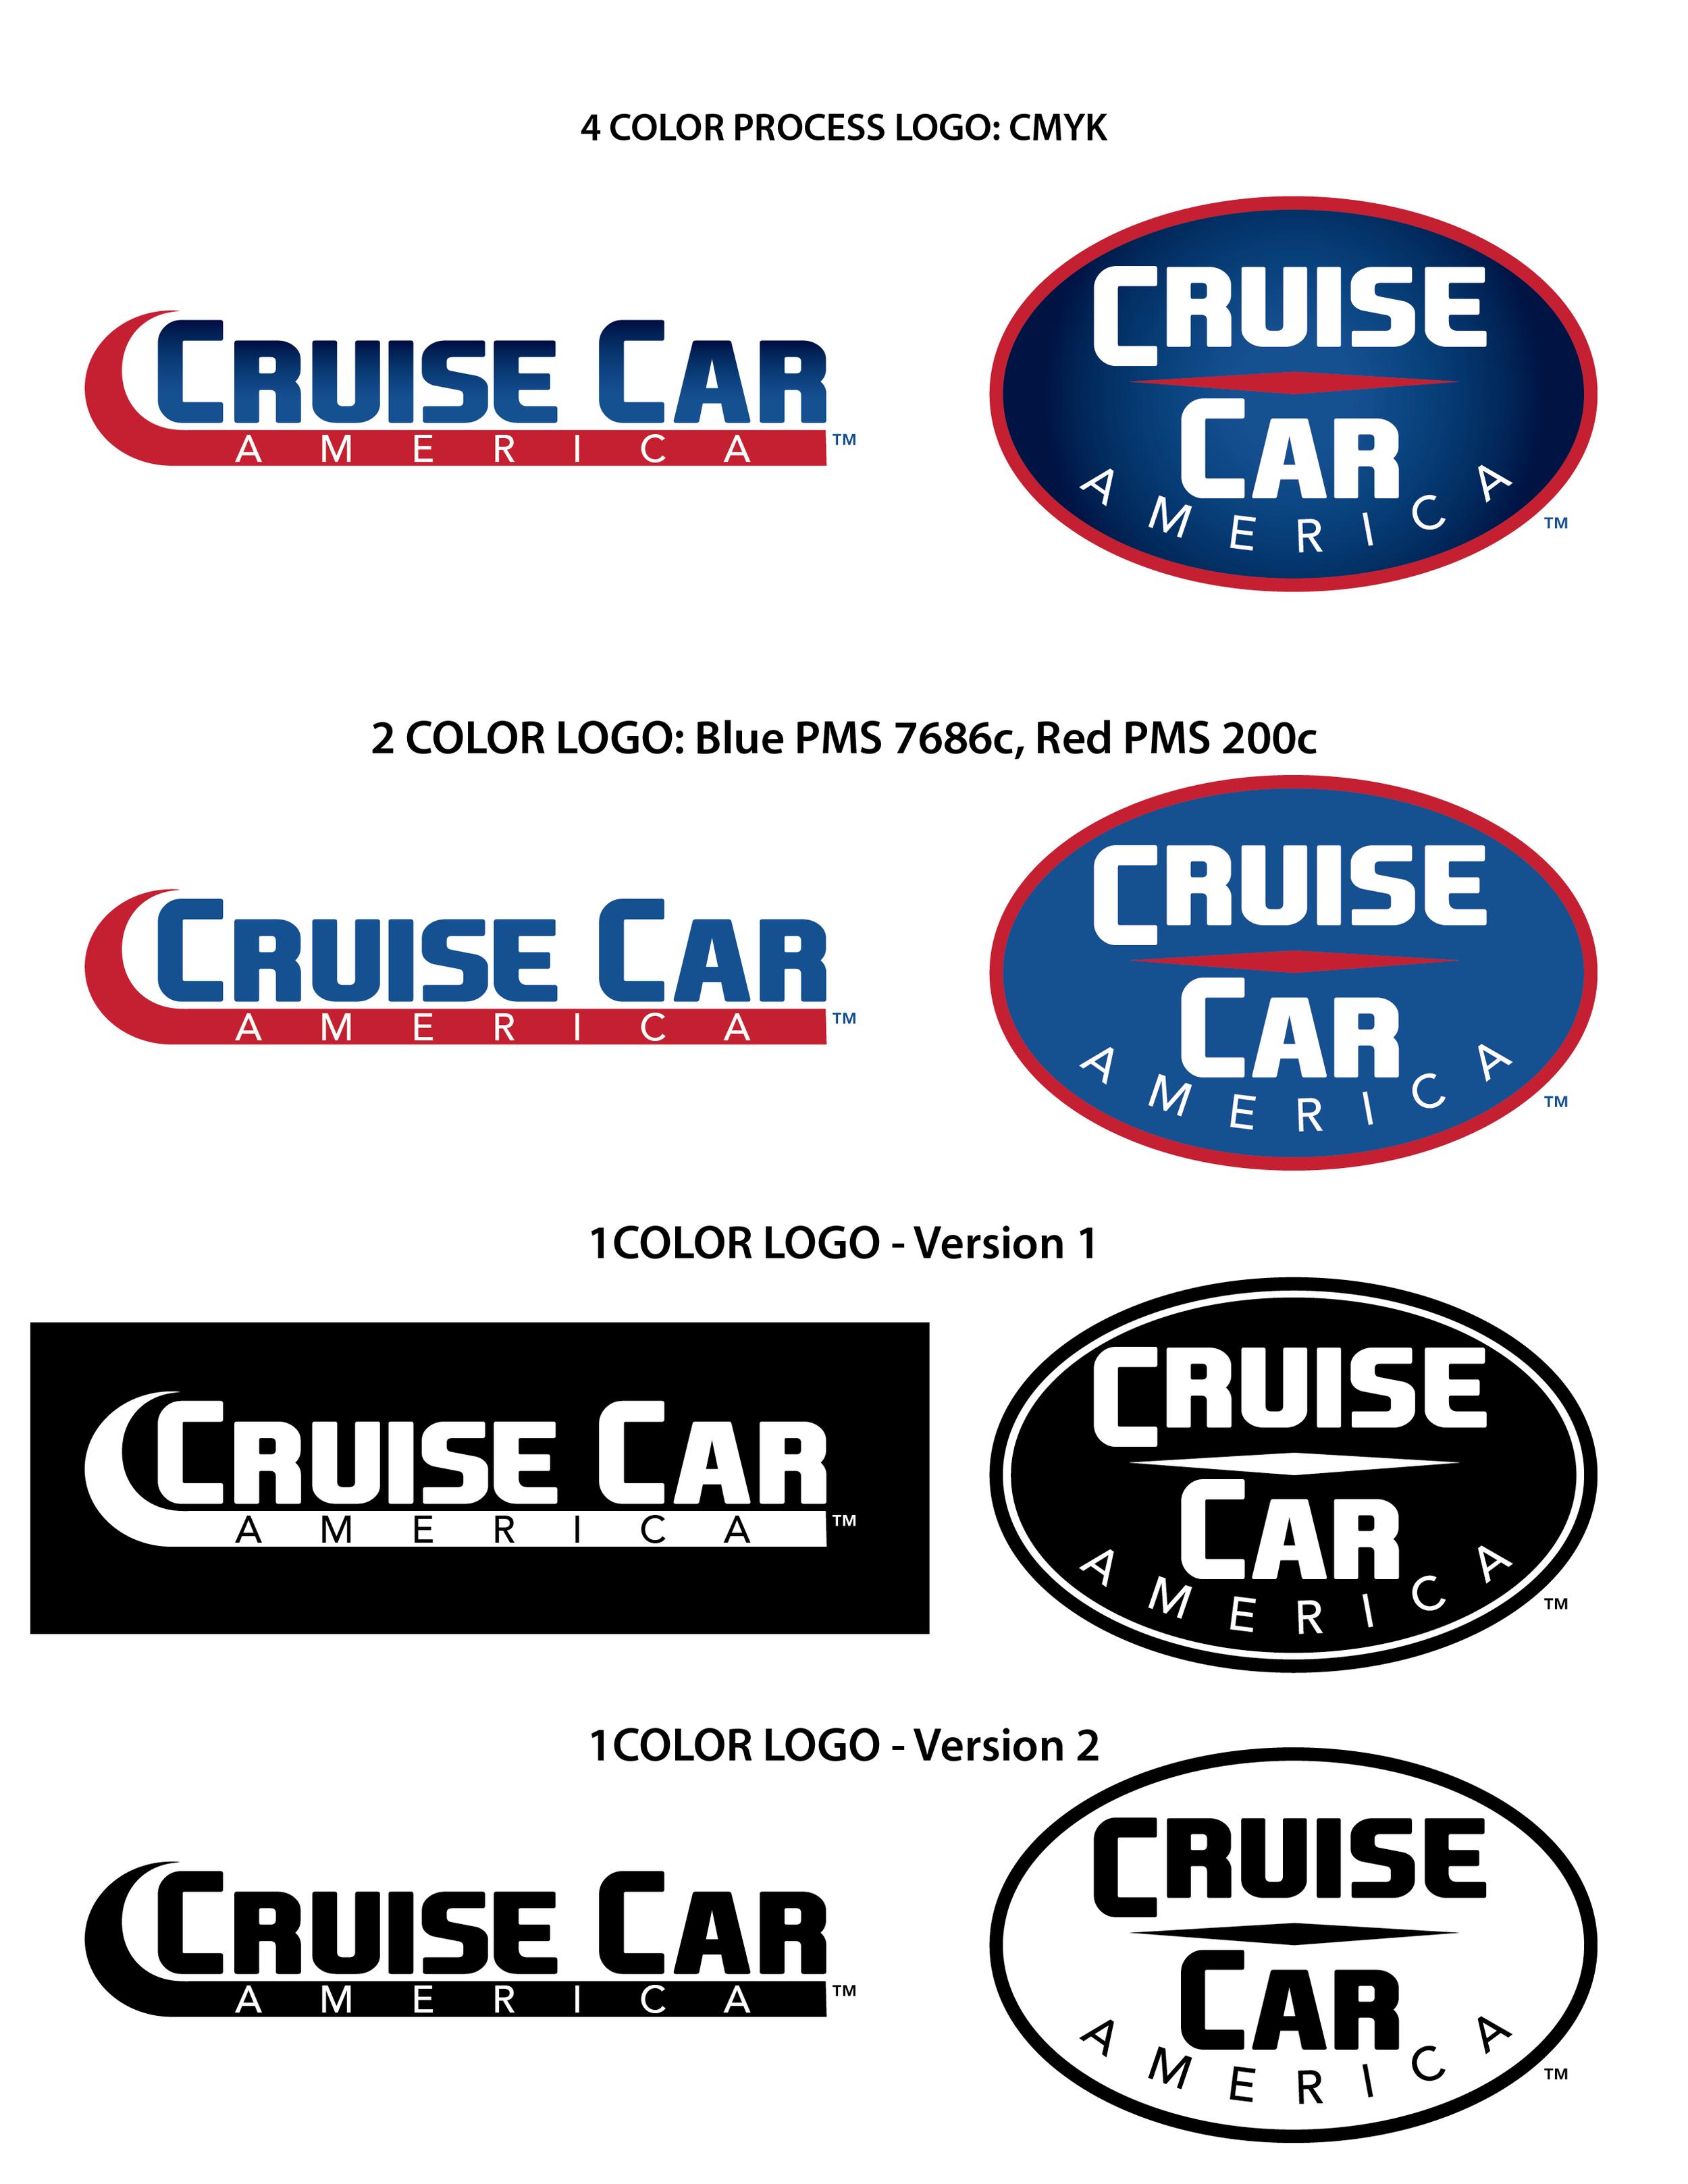 CruiseCarAmerica-LogoConcepts5-01.PNG